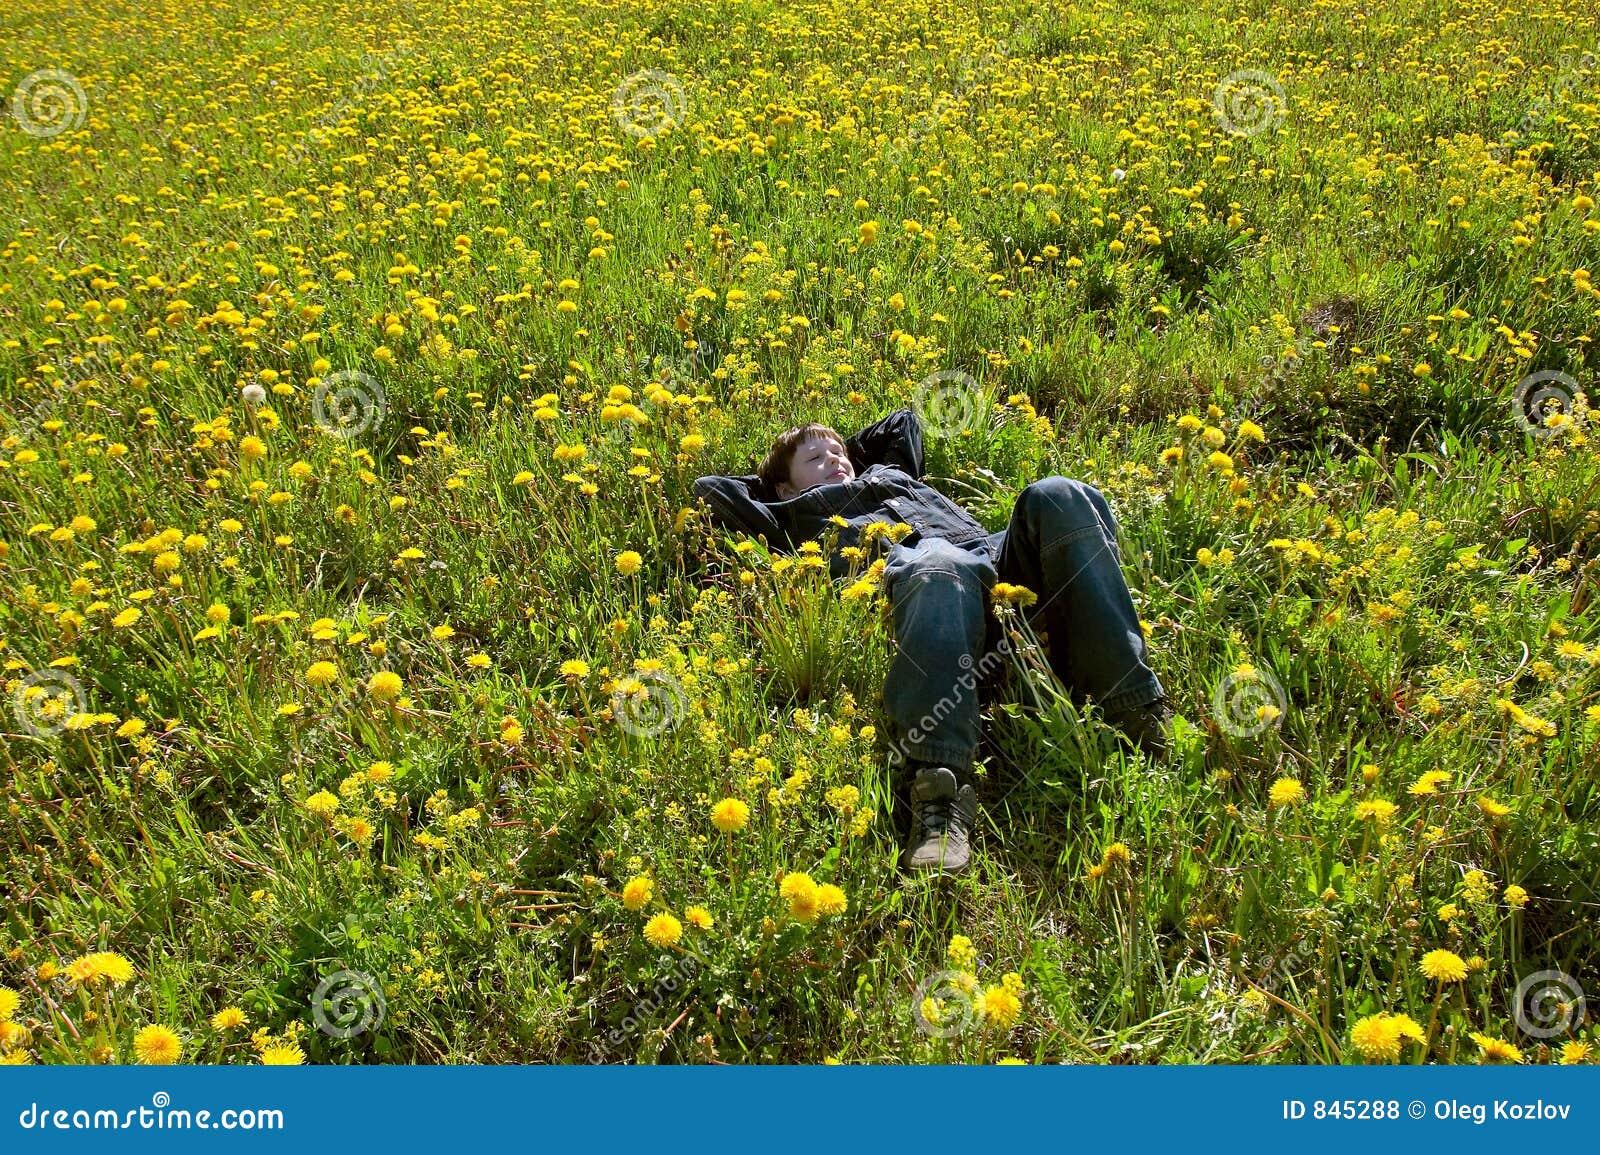 Young boy in flwer field